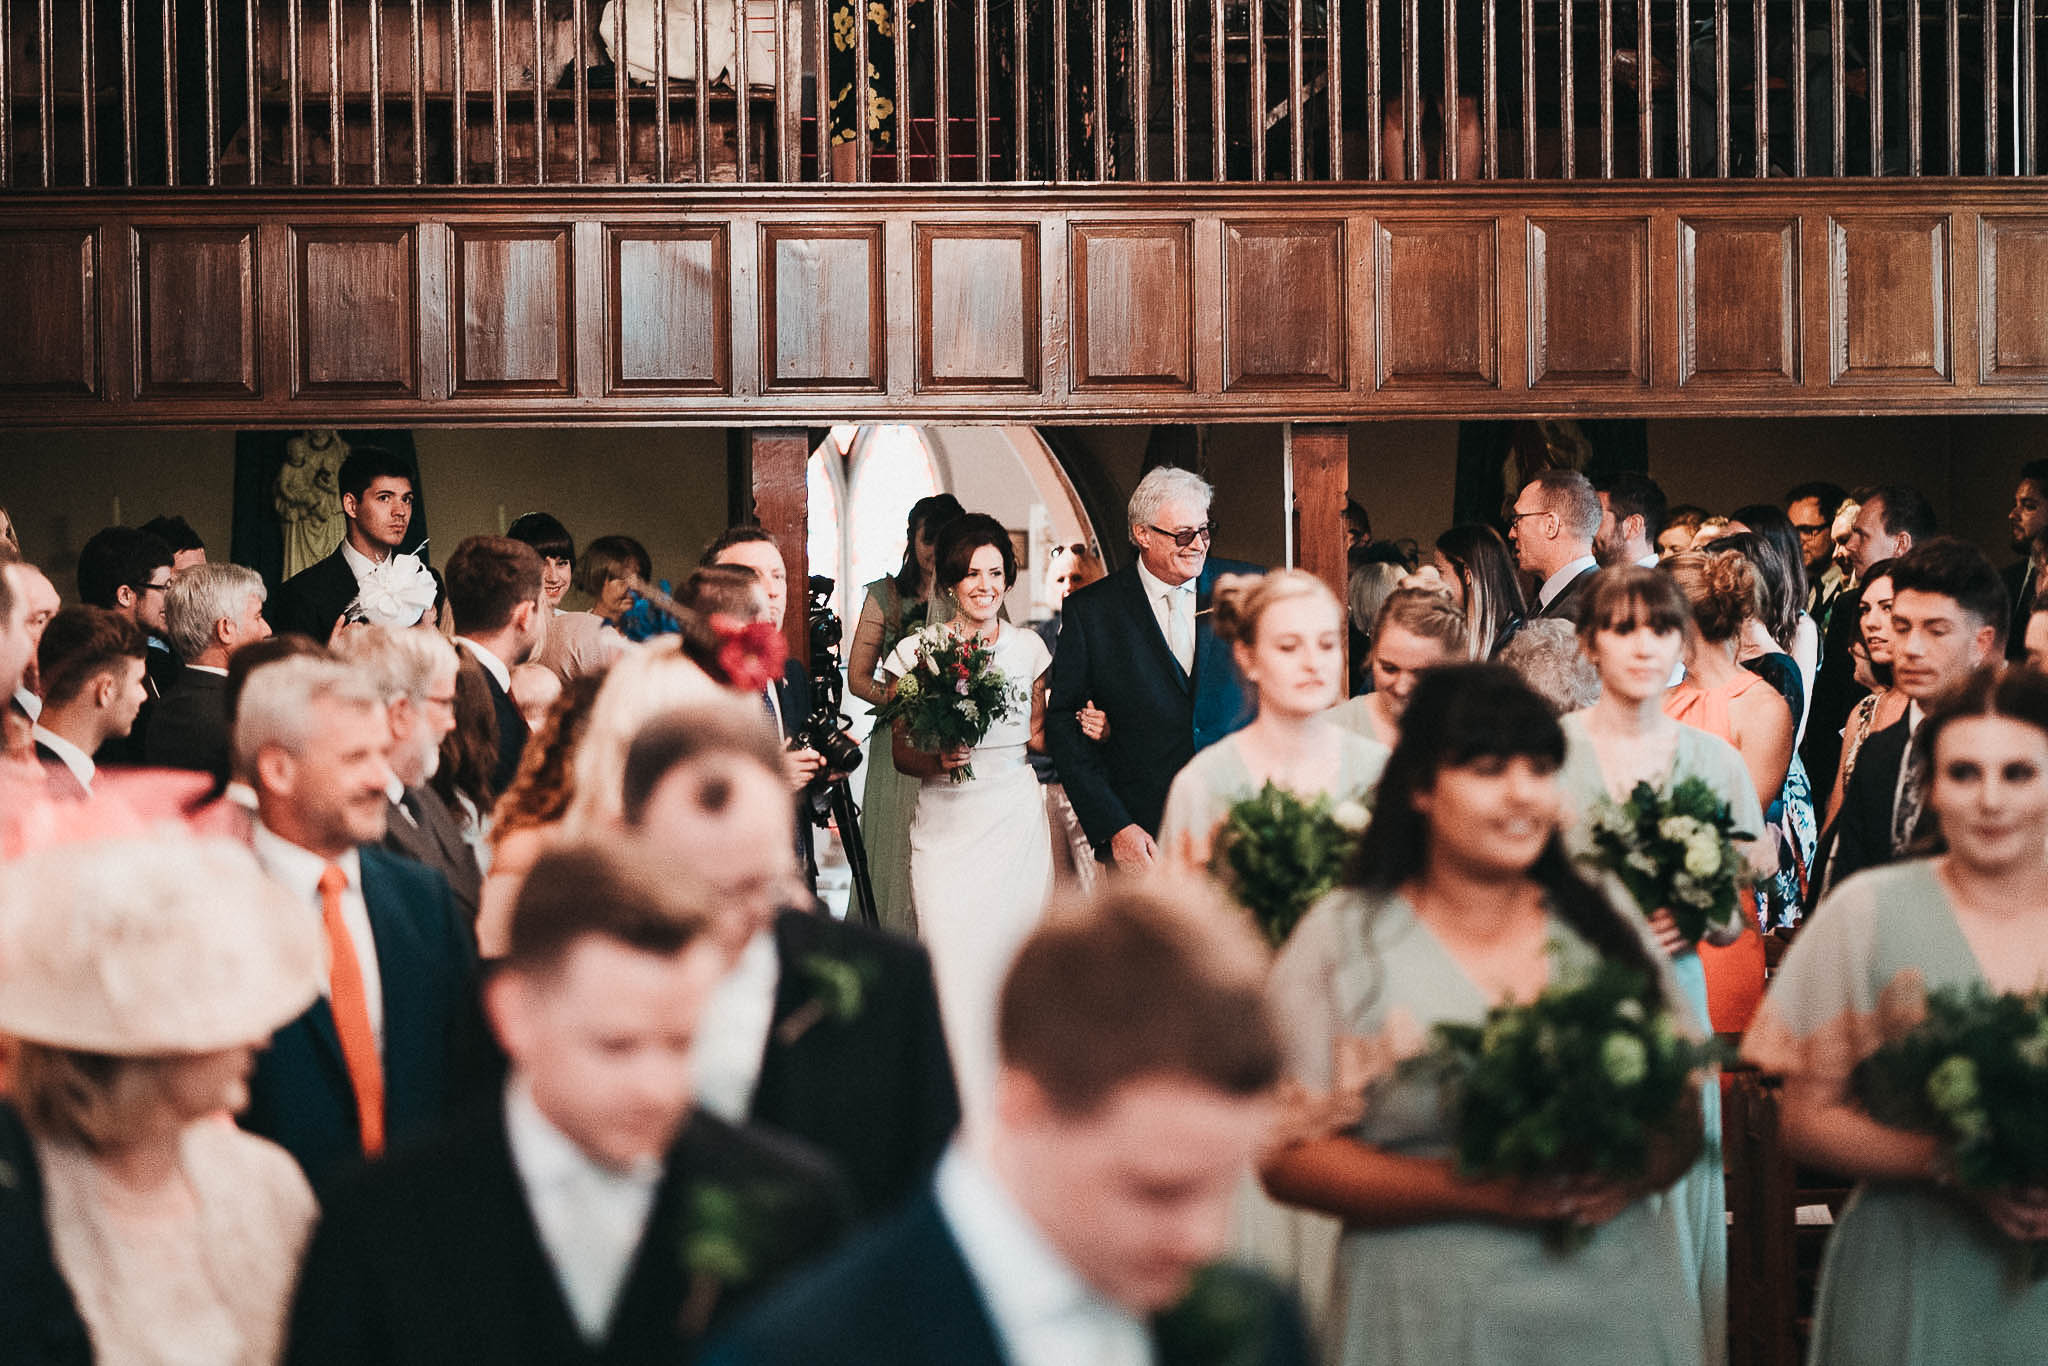 bride-coming-down-aisle